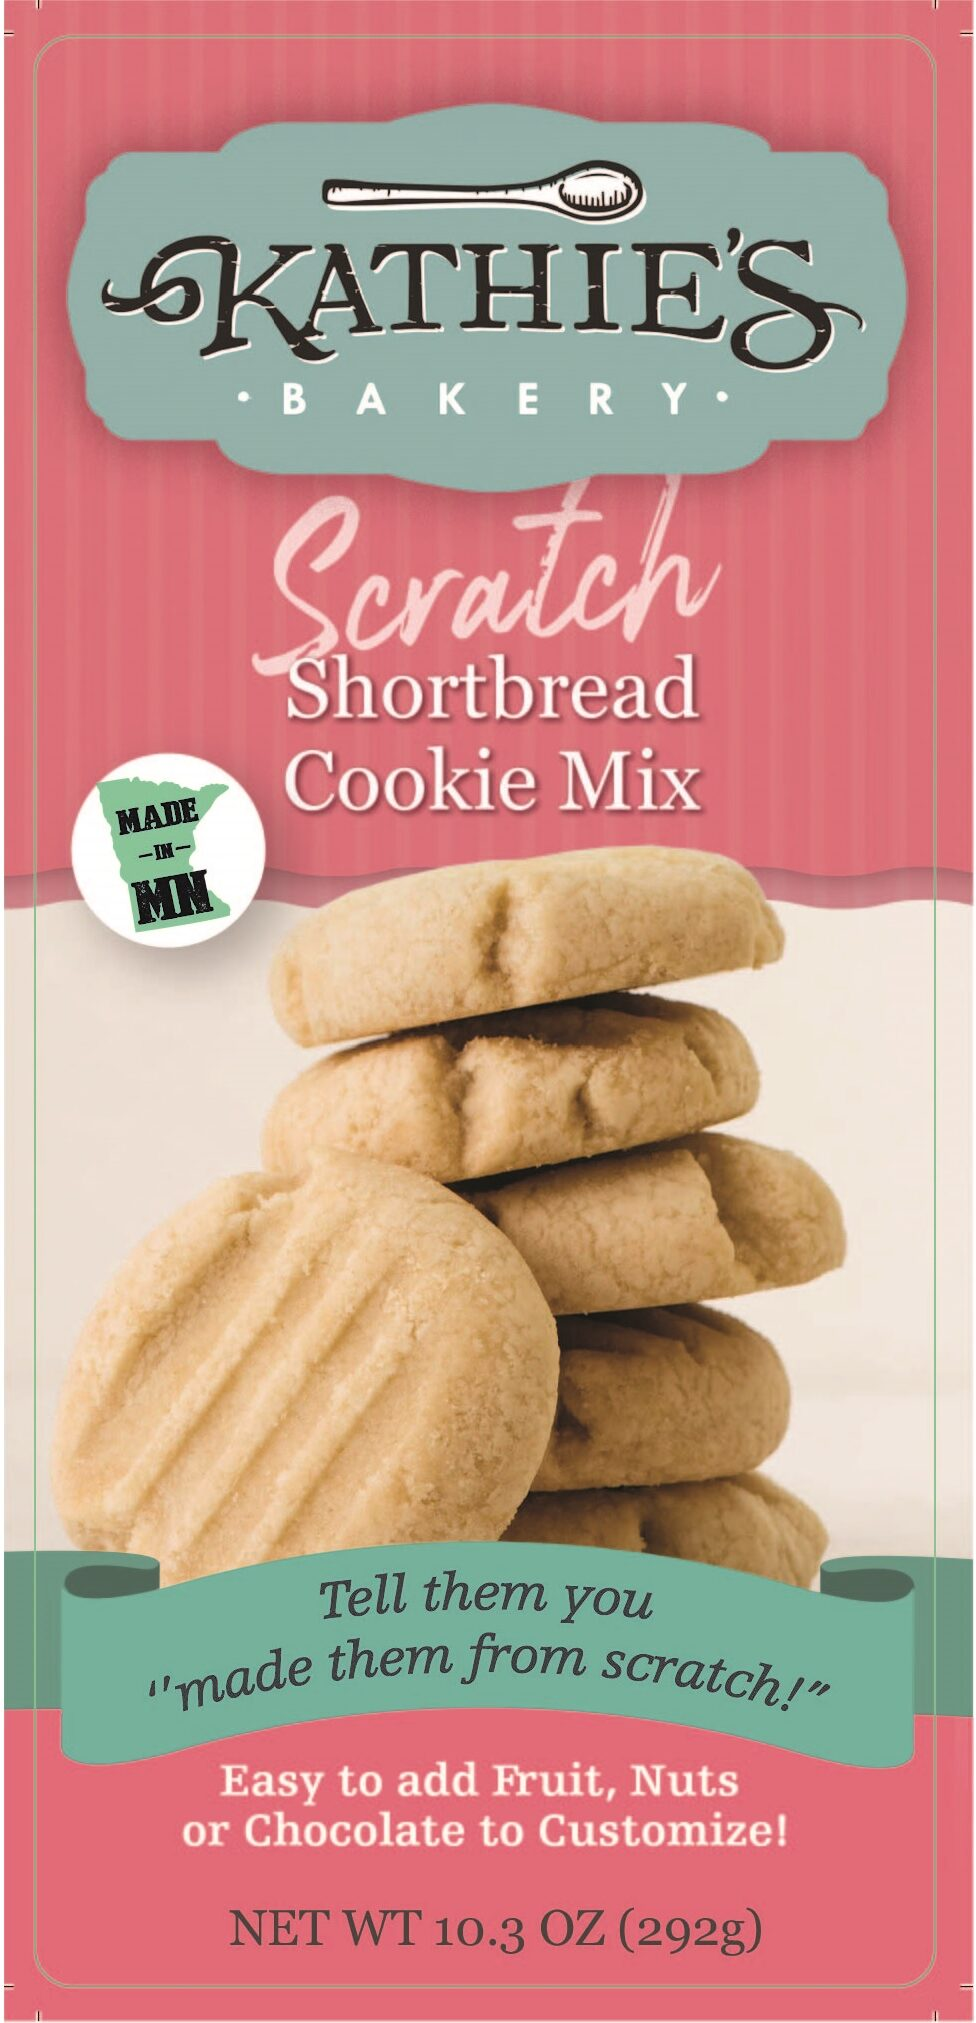 Serve Kathie's Cookies